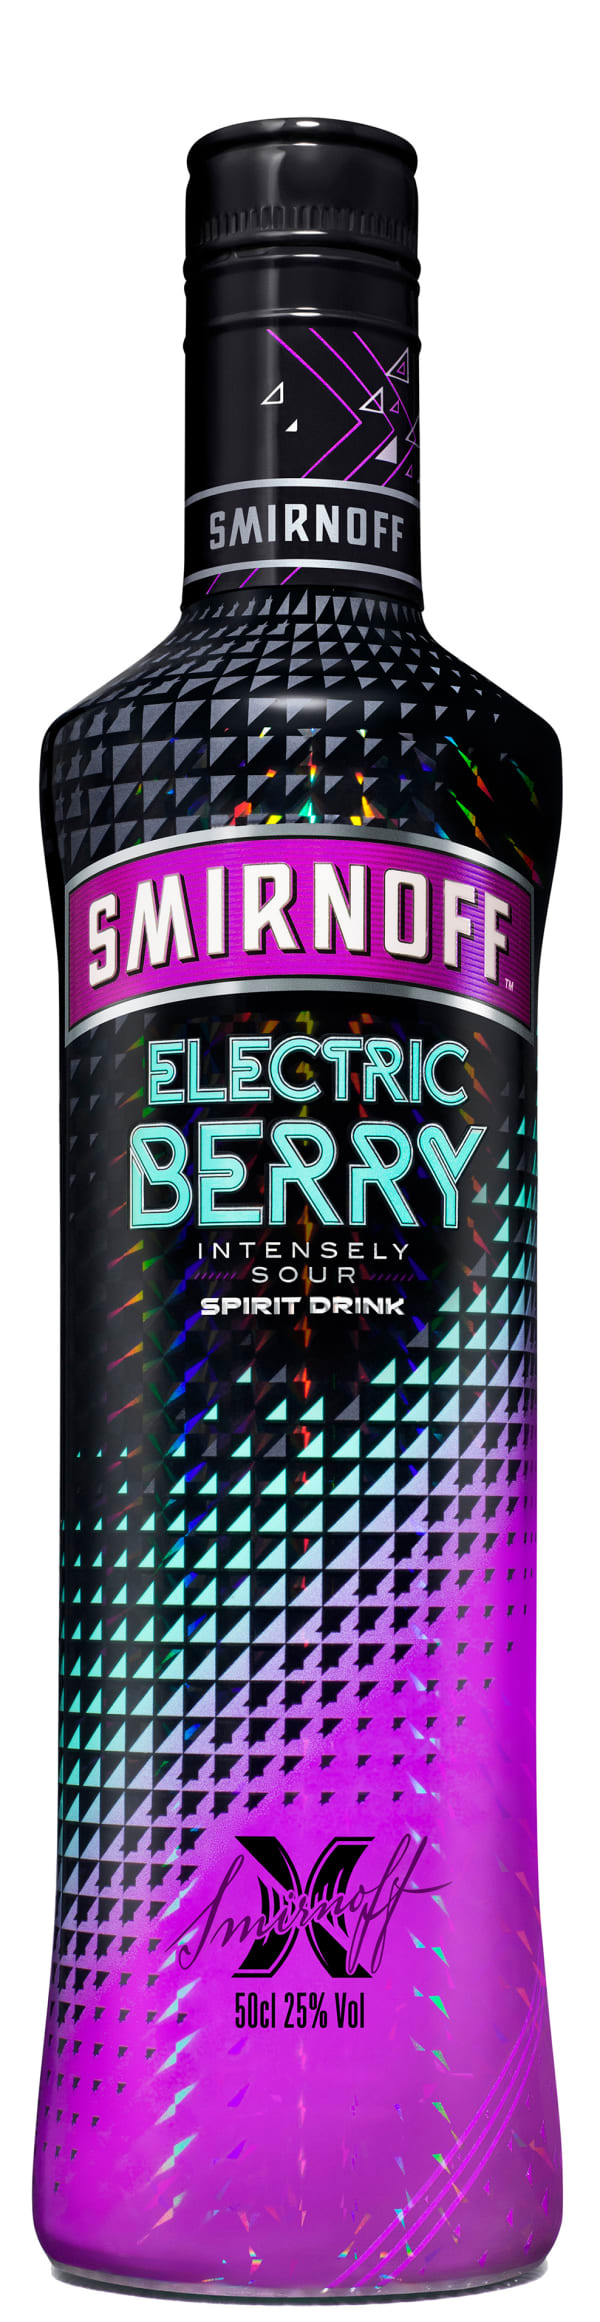 Smirnoff Electric Berry